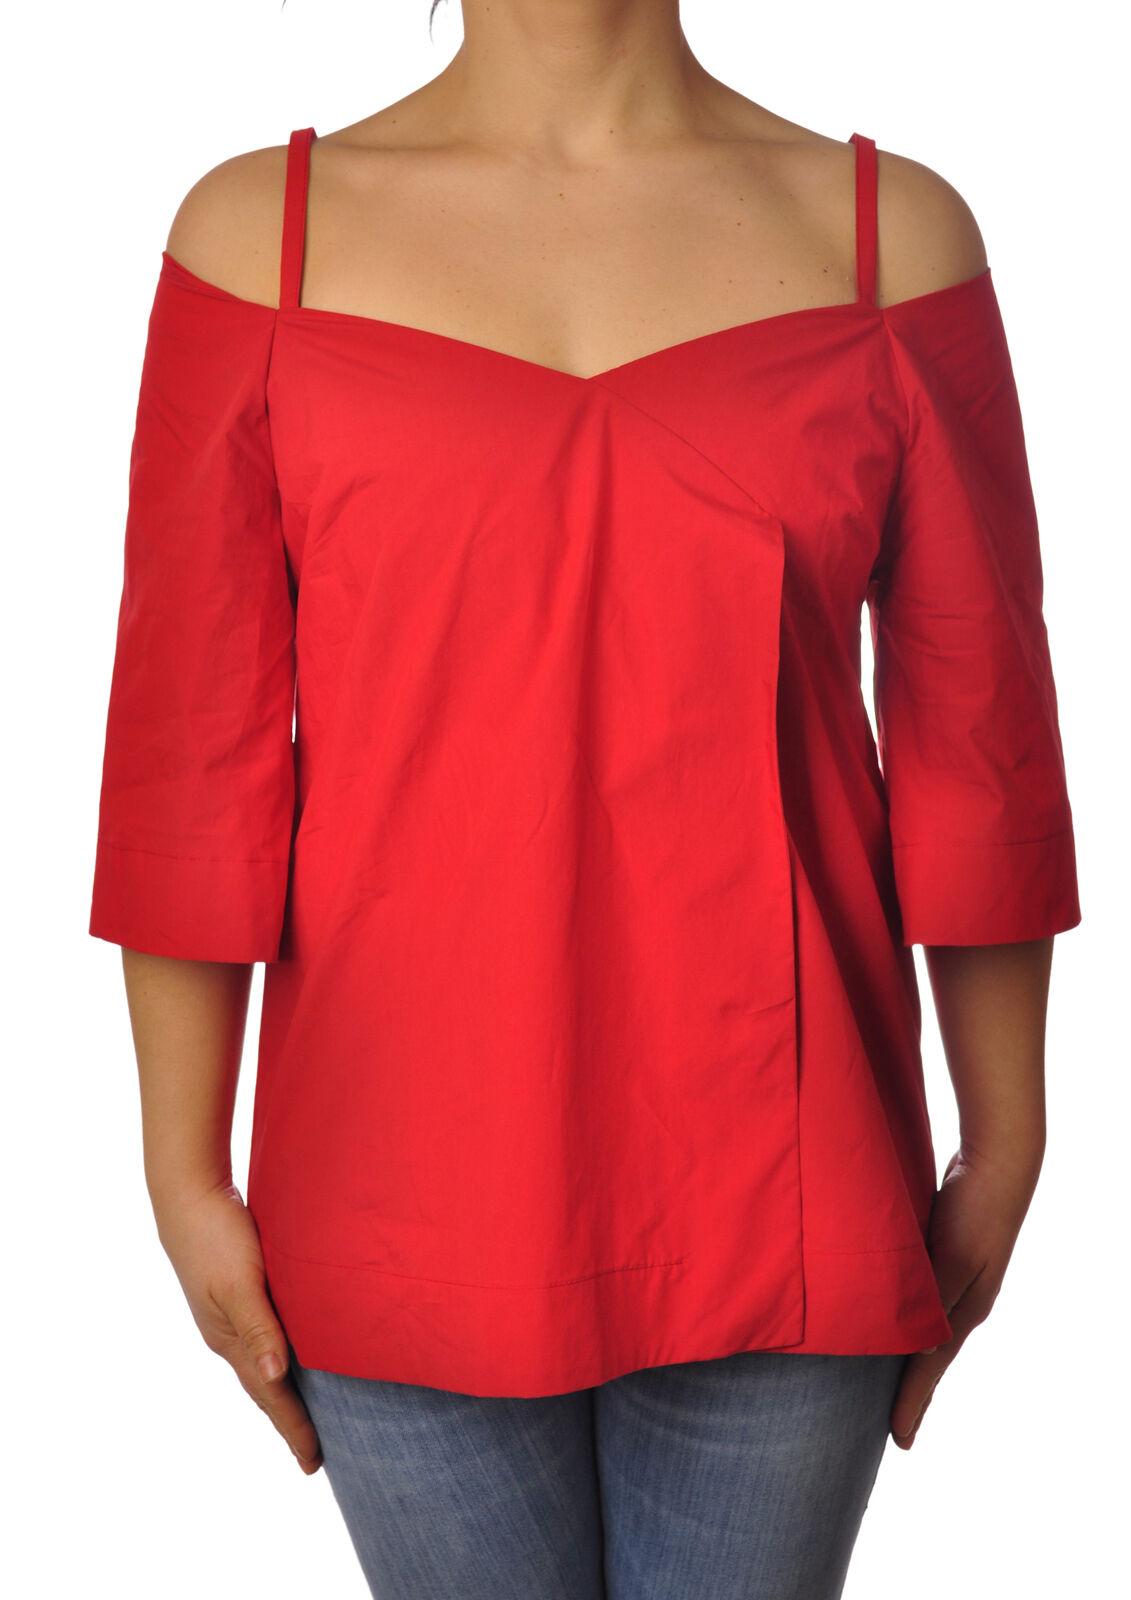 Ottod'ame - Shirts-Blouses - Woman - rot - 4955113F183810